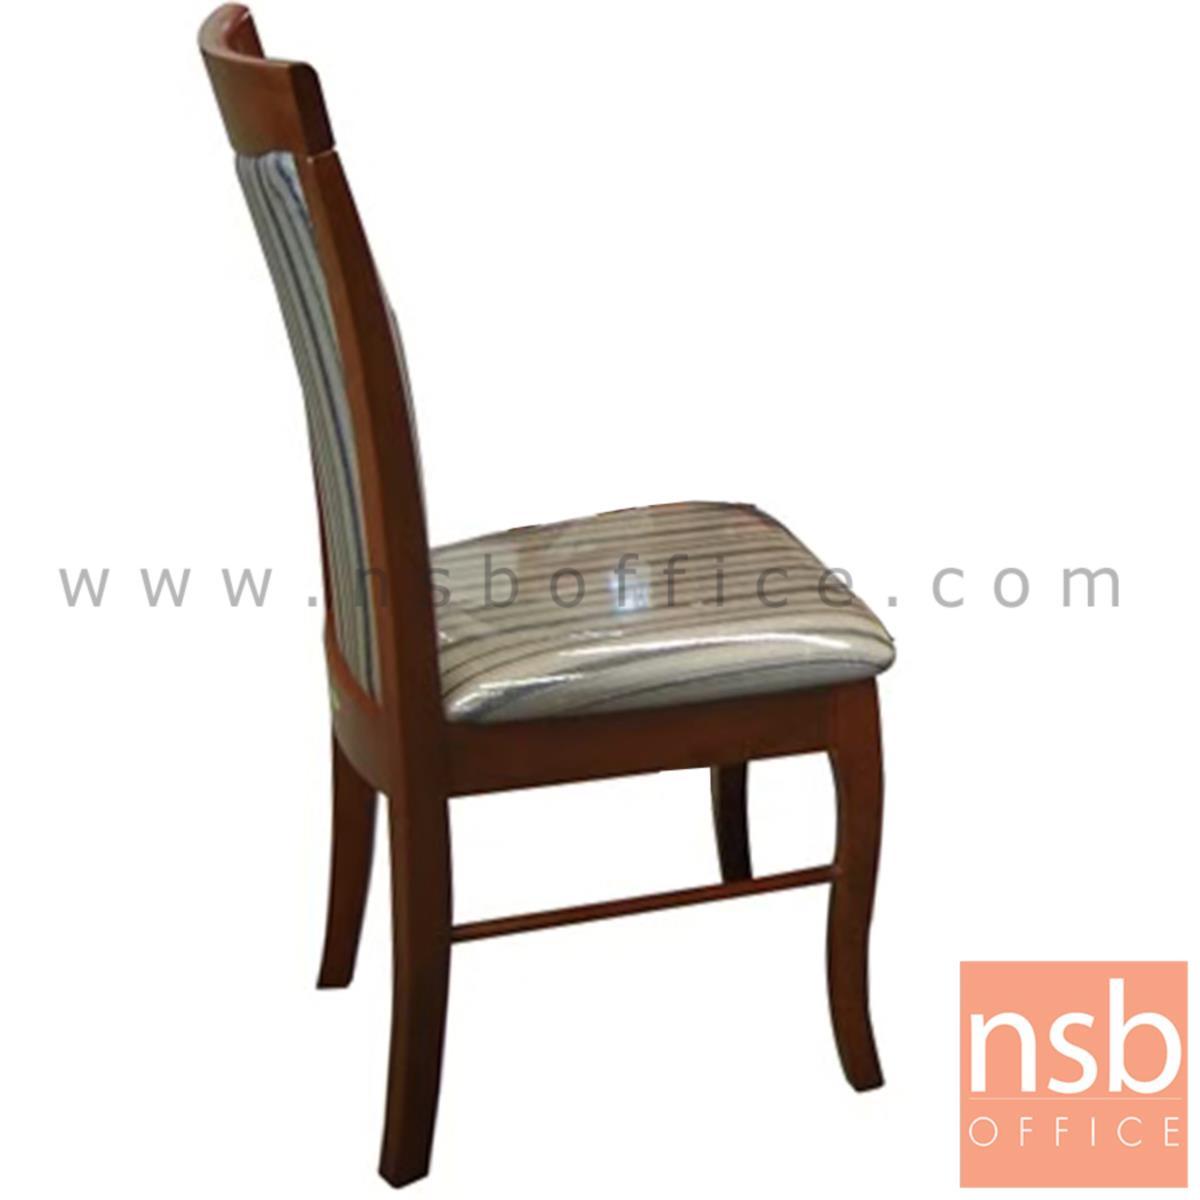 B22A157:ก้าอี้ไม้ที่นั่งหนังเทียม รุ่น STABLE  ขาไม้ สีน้ำตาลแดง